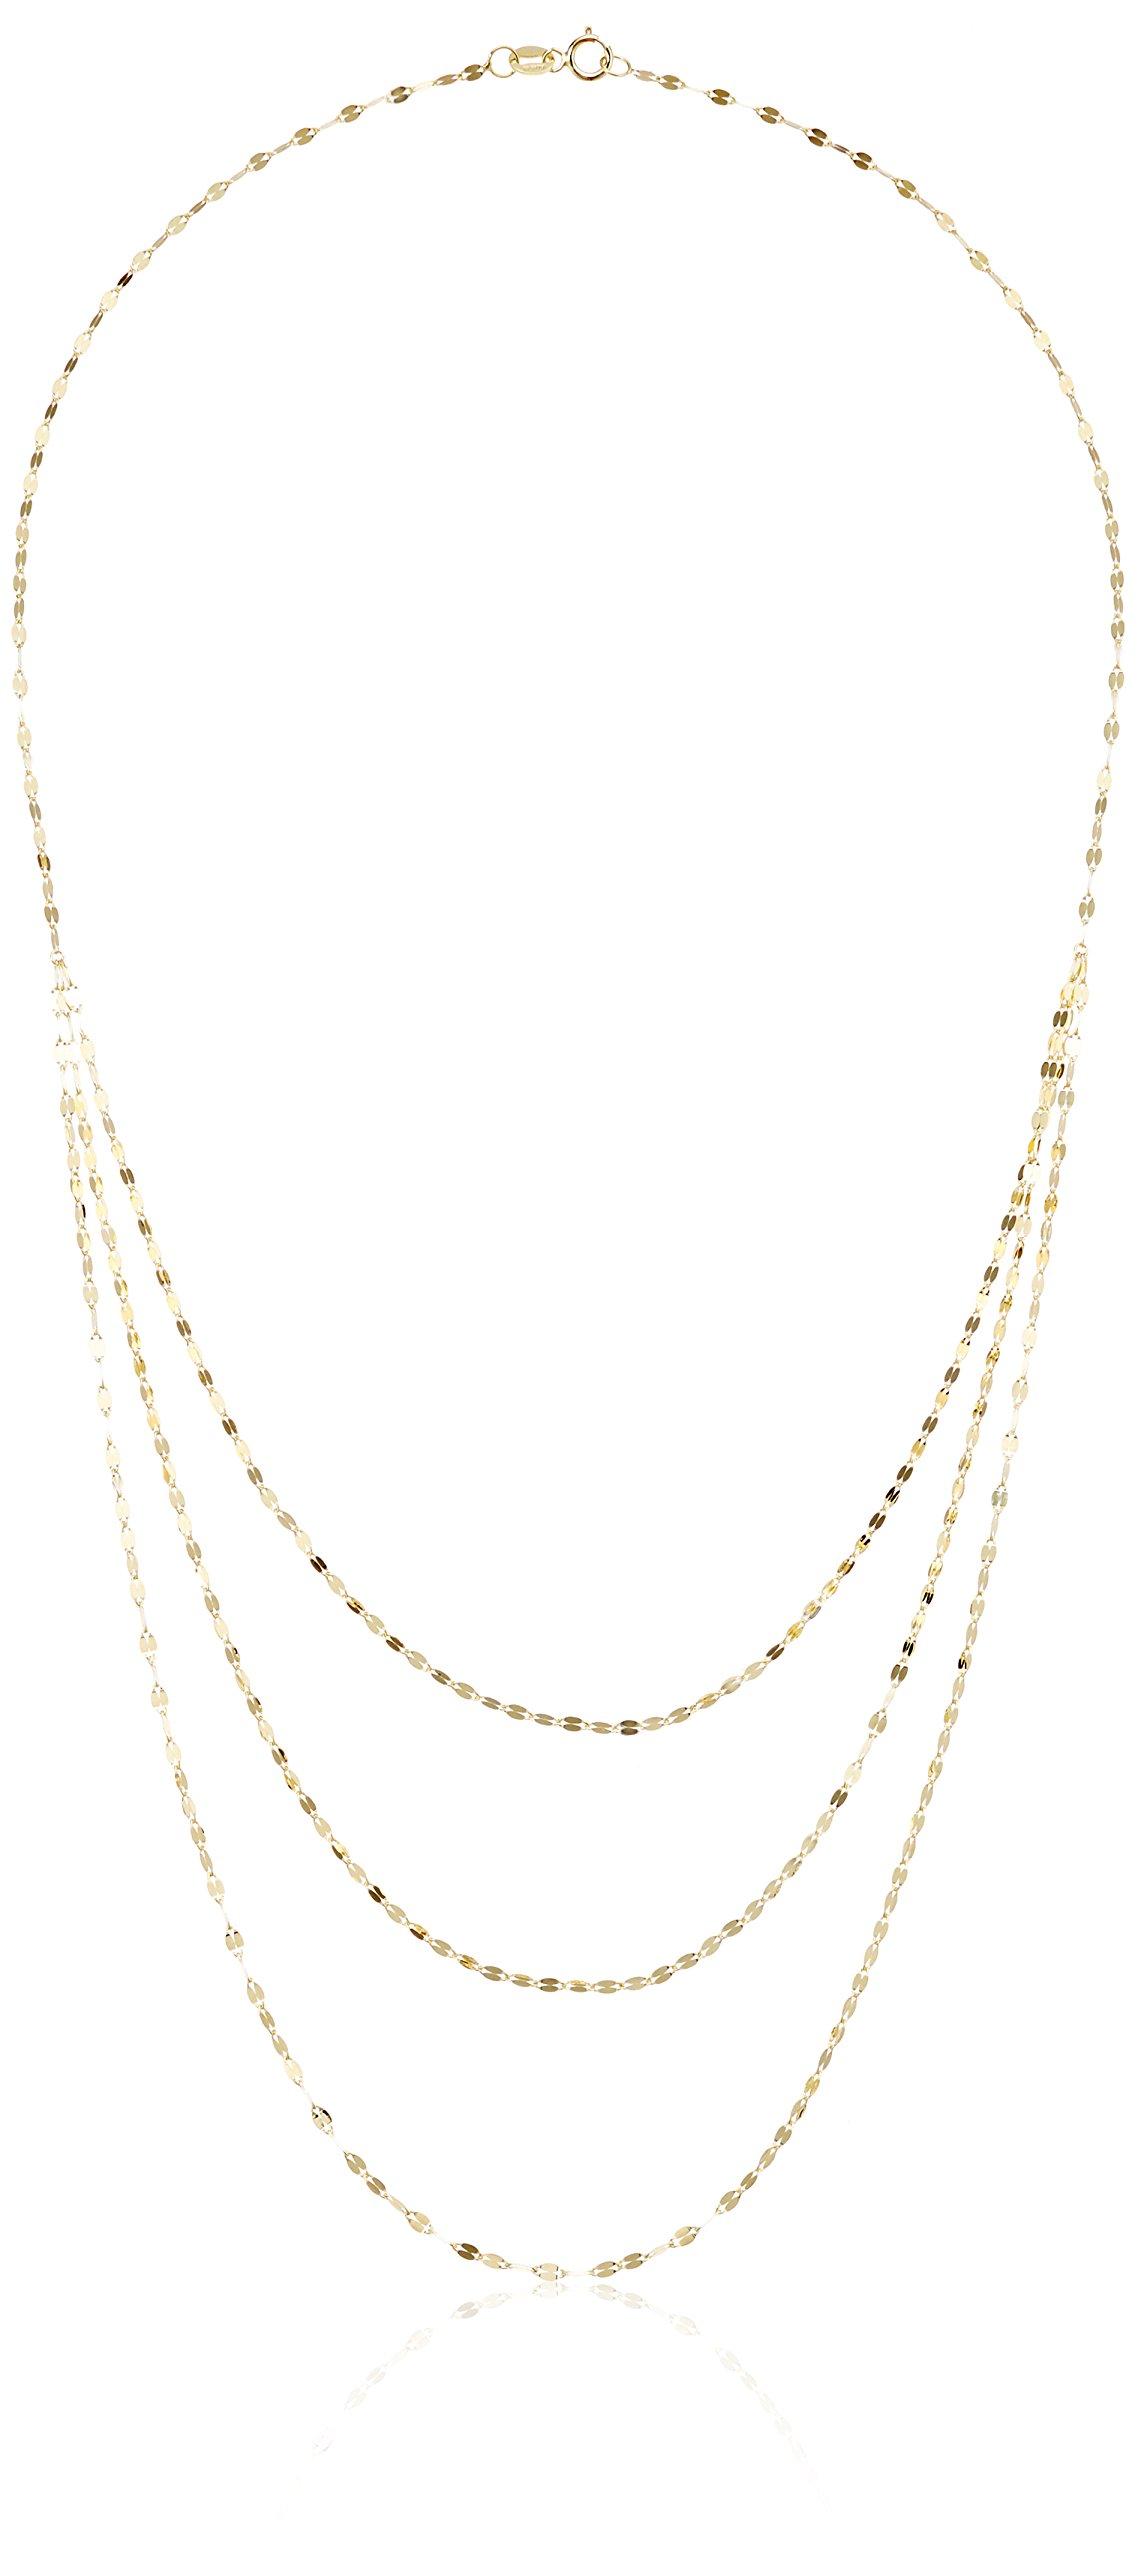 TreEsse Italian 10k Yellow Gold Three Strand Graduated Chain Necklace, 18''